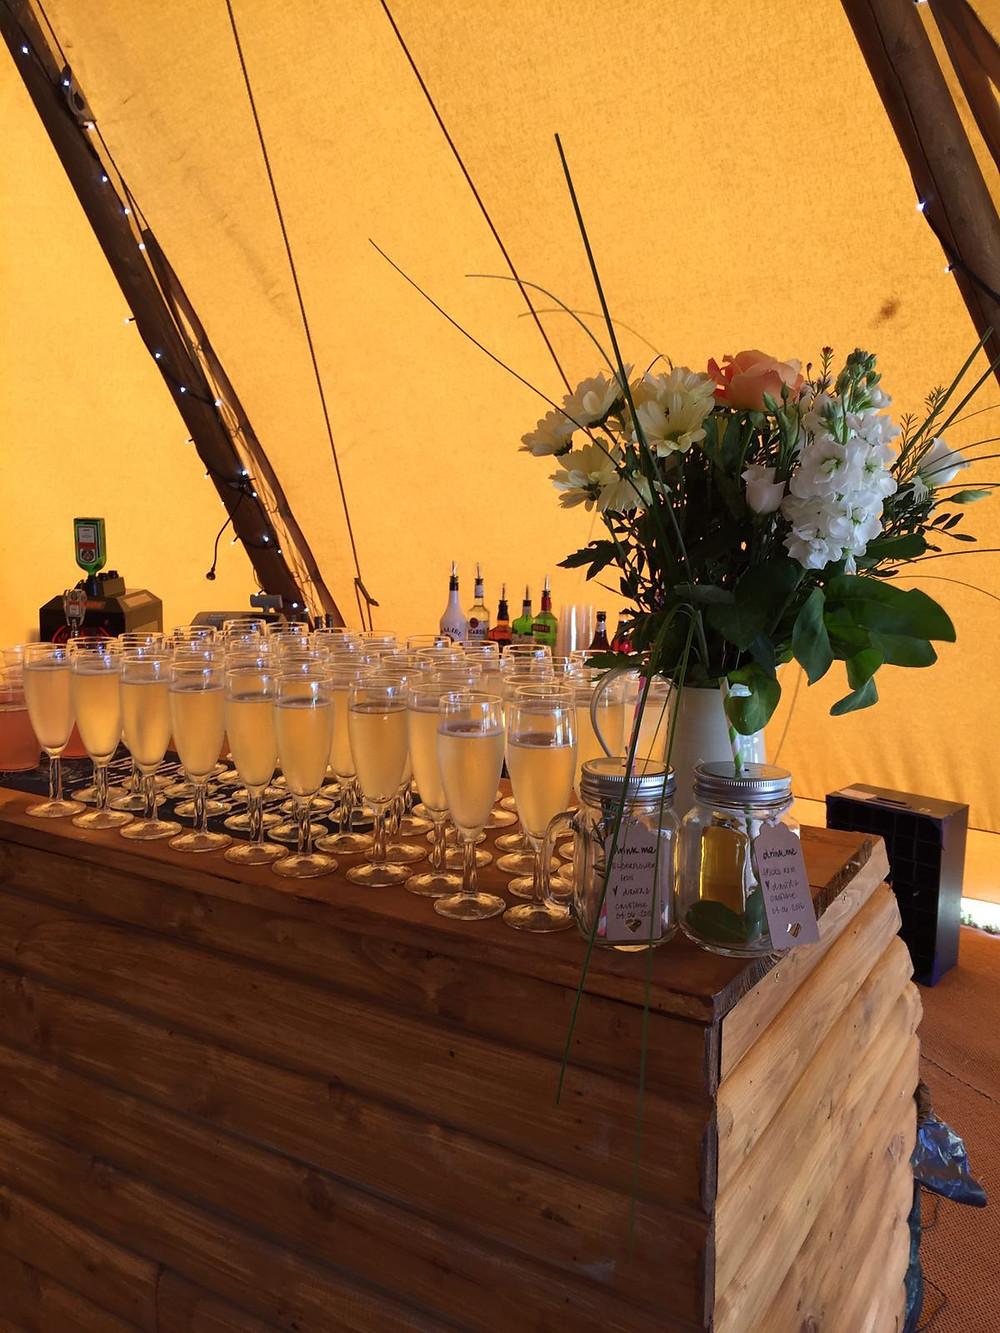 Wooden rustic wedding bar